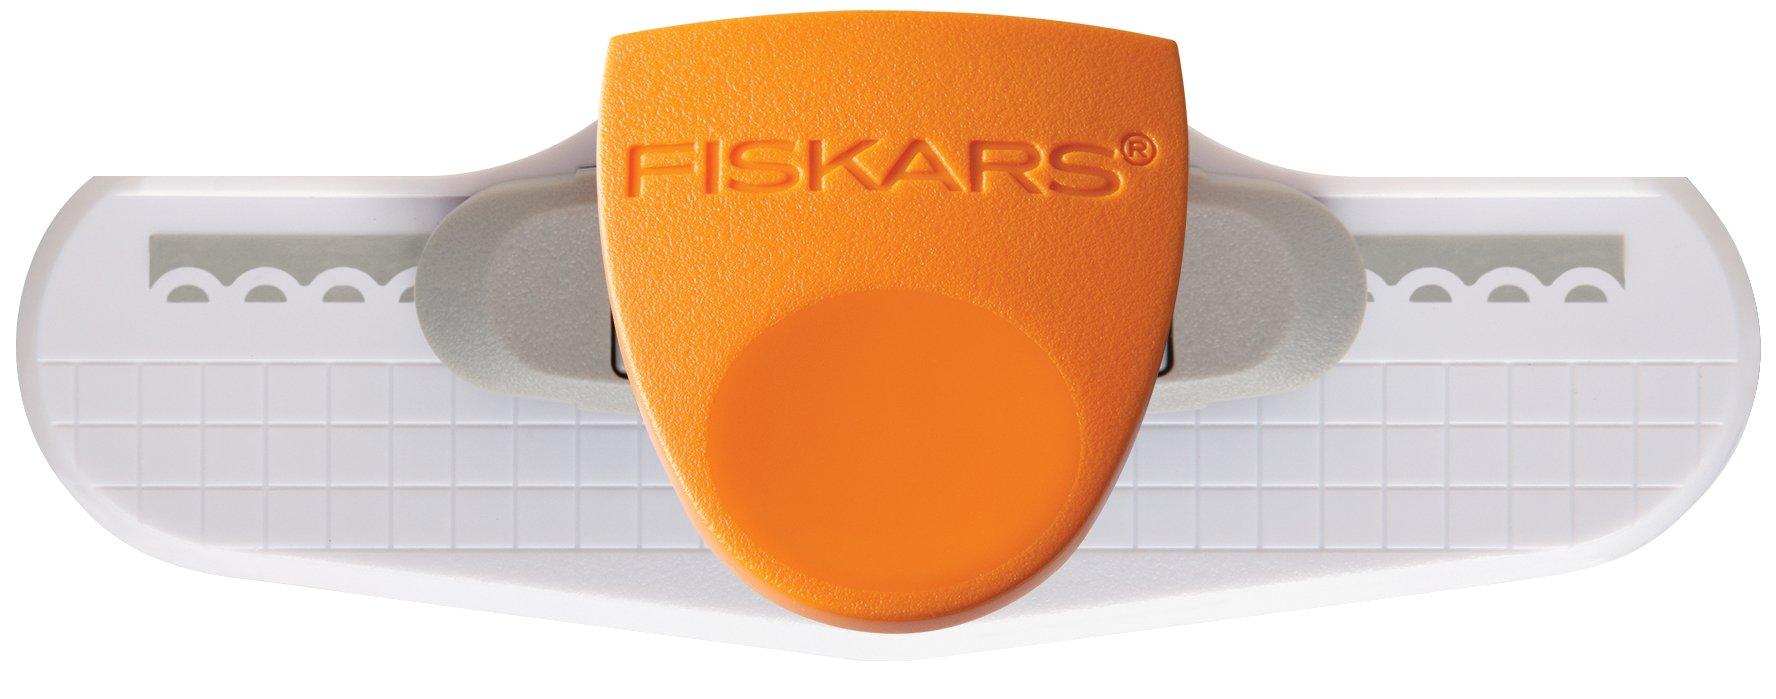 Fiskars Border Punch, Apron Lace